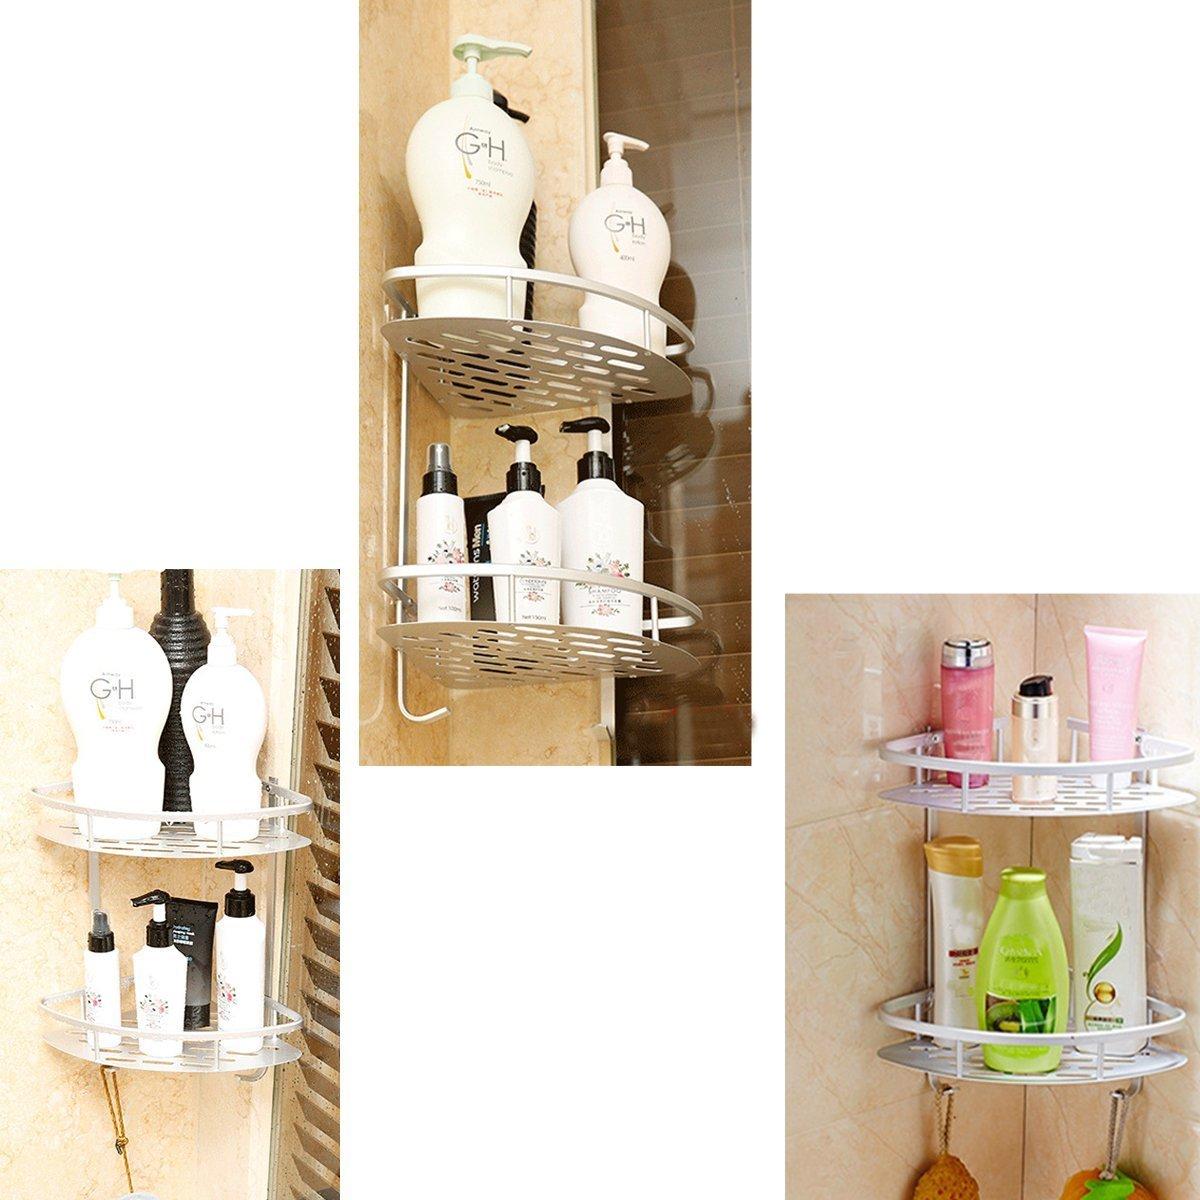 Lancher Bathroom Shelf (No Drilling) Durable Aluminum 2 tiers shower shelf Kitchen storage basket Adhesive Suction Corner Shelves Shower Caddy by Lancher (Image #8)